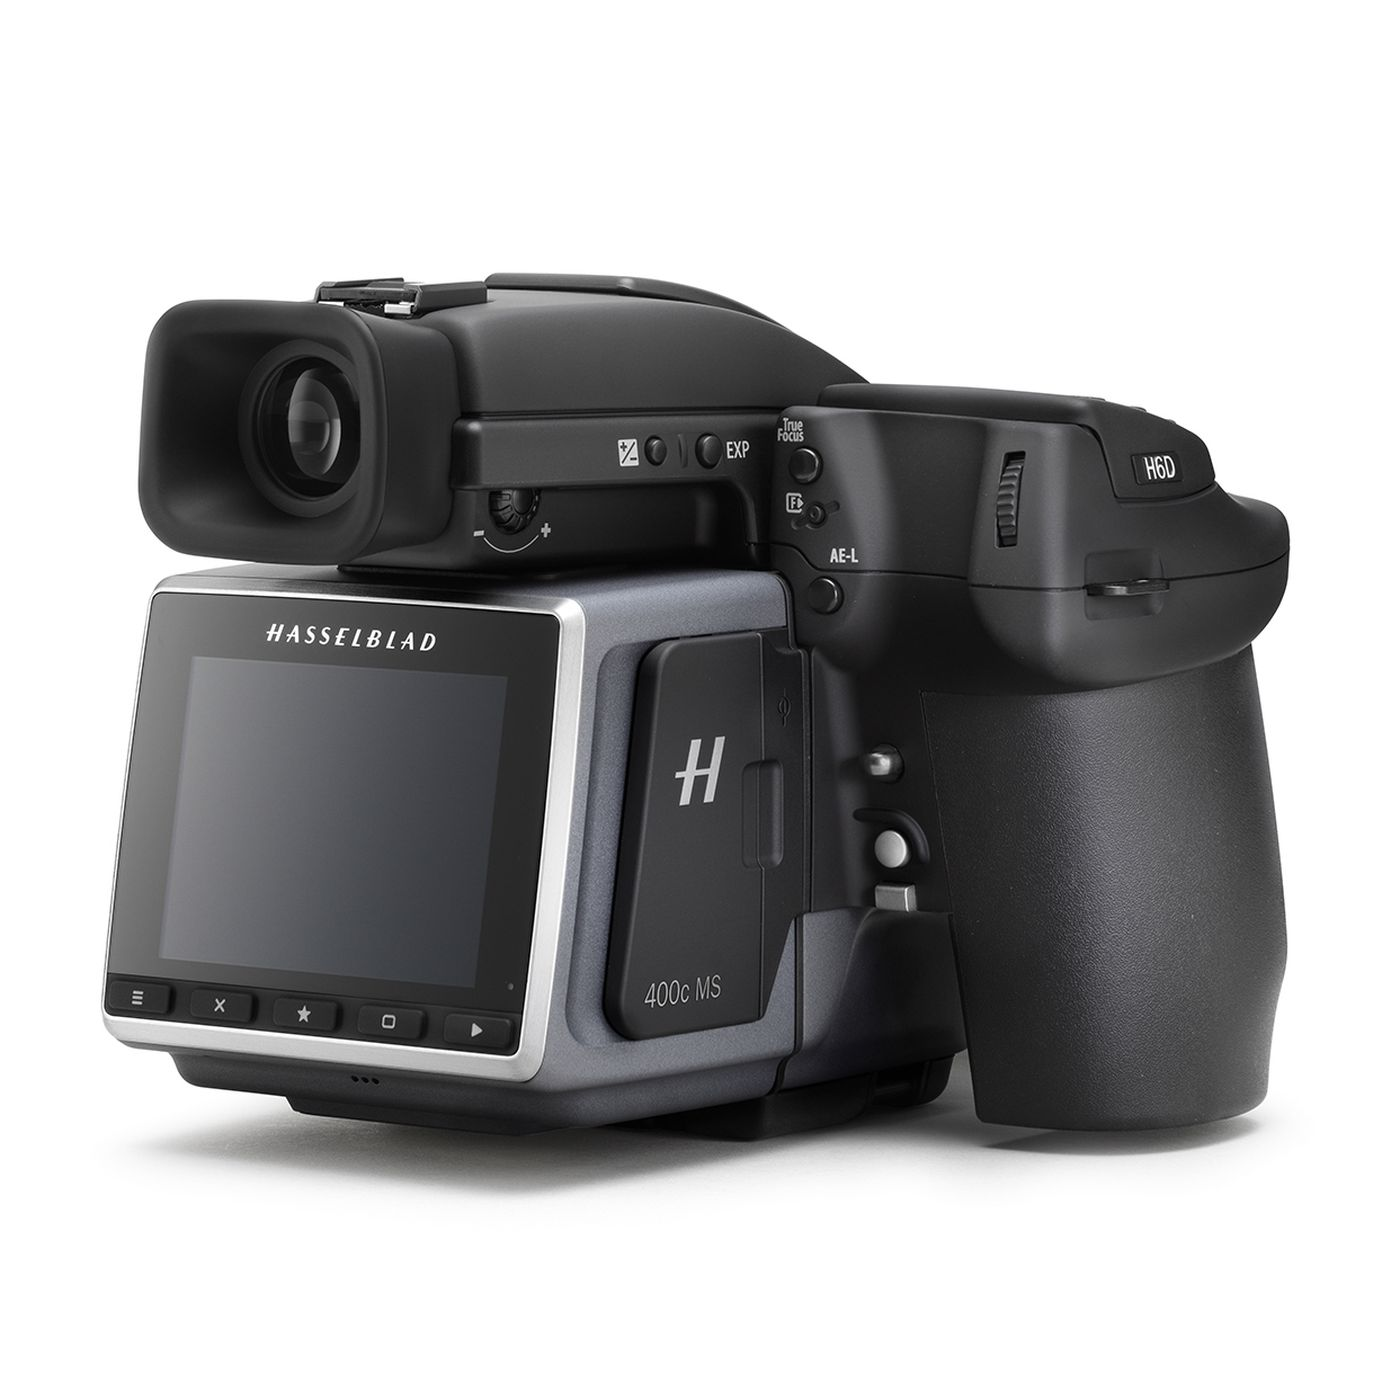 H Elblads New 400 Megapixel Multi Scamera Captures 2 4gb Stills The Verge